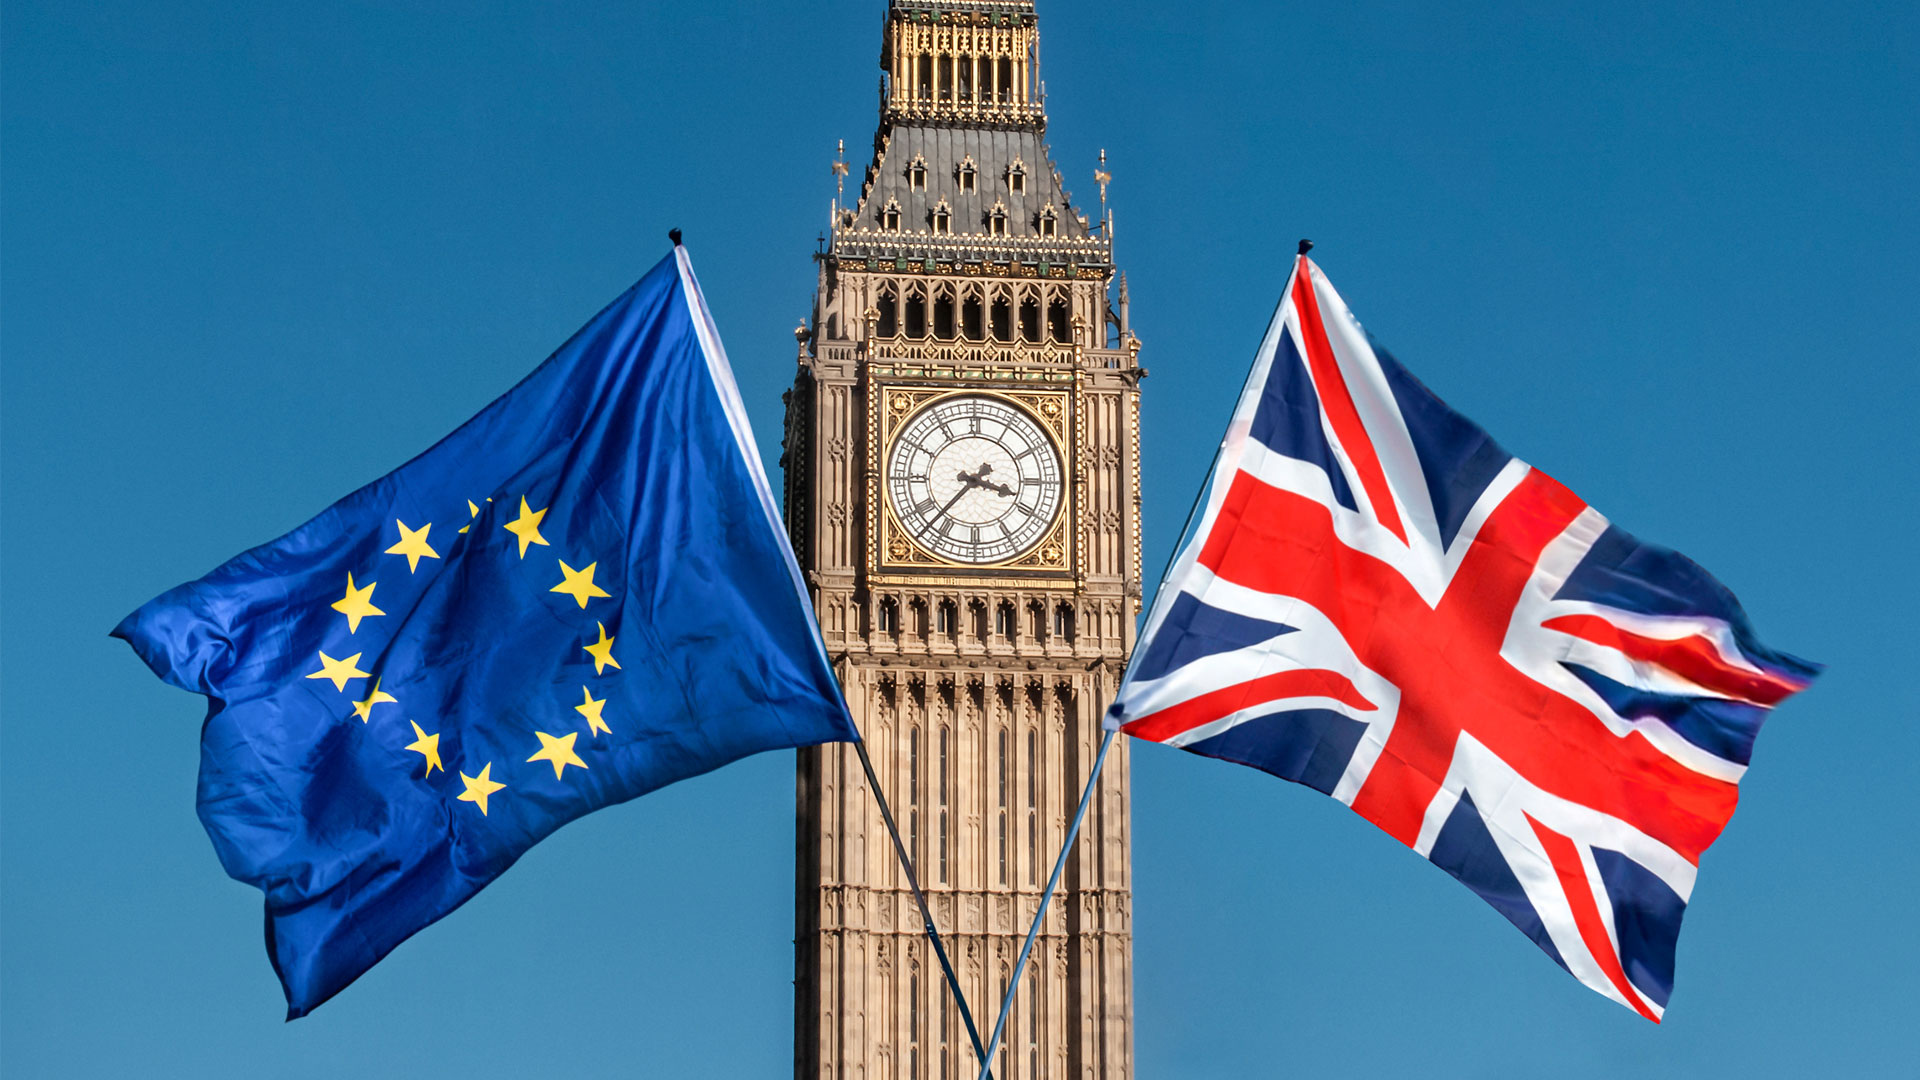 banner__eu-uk-flags-big-ben.jpg